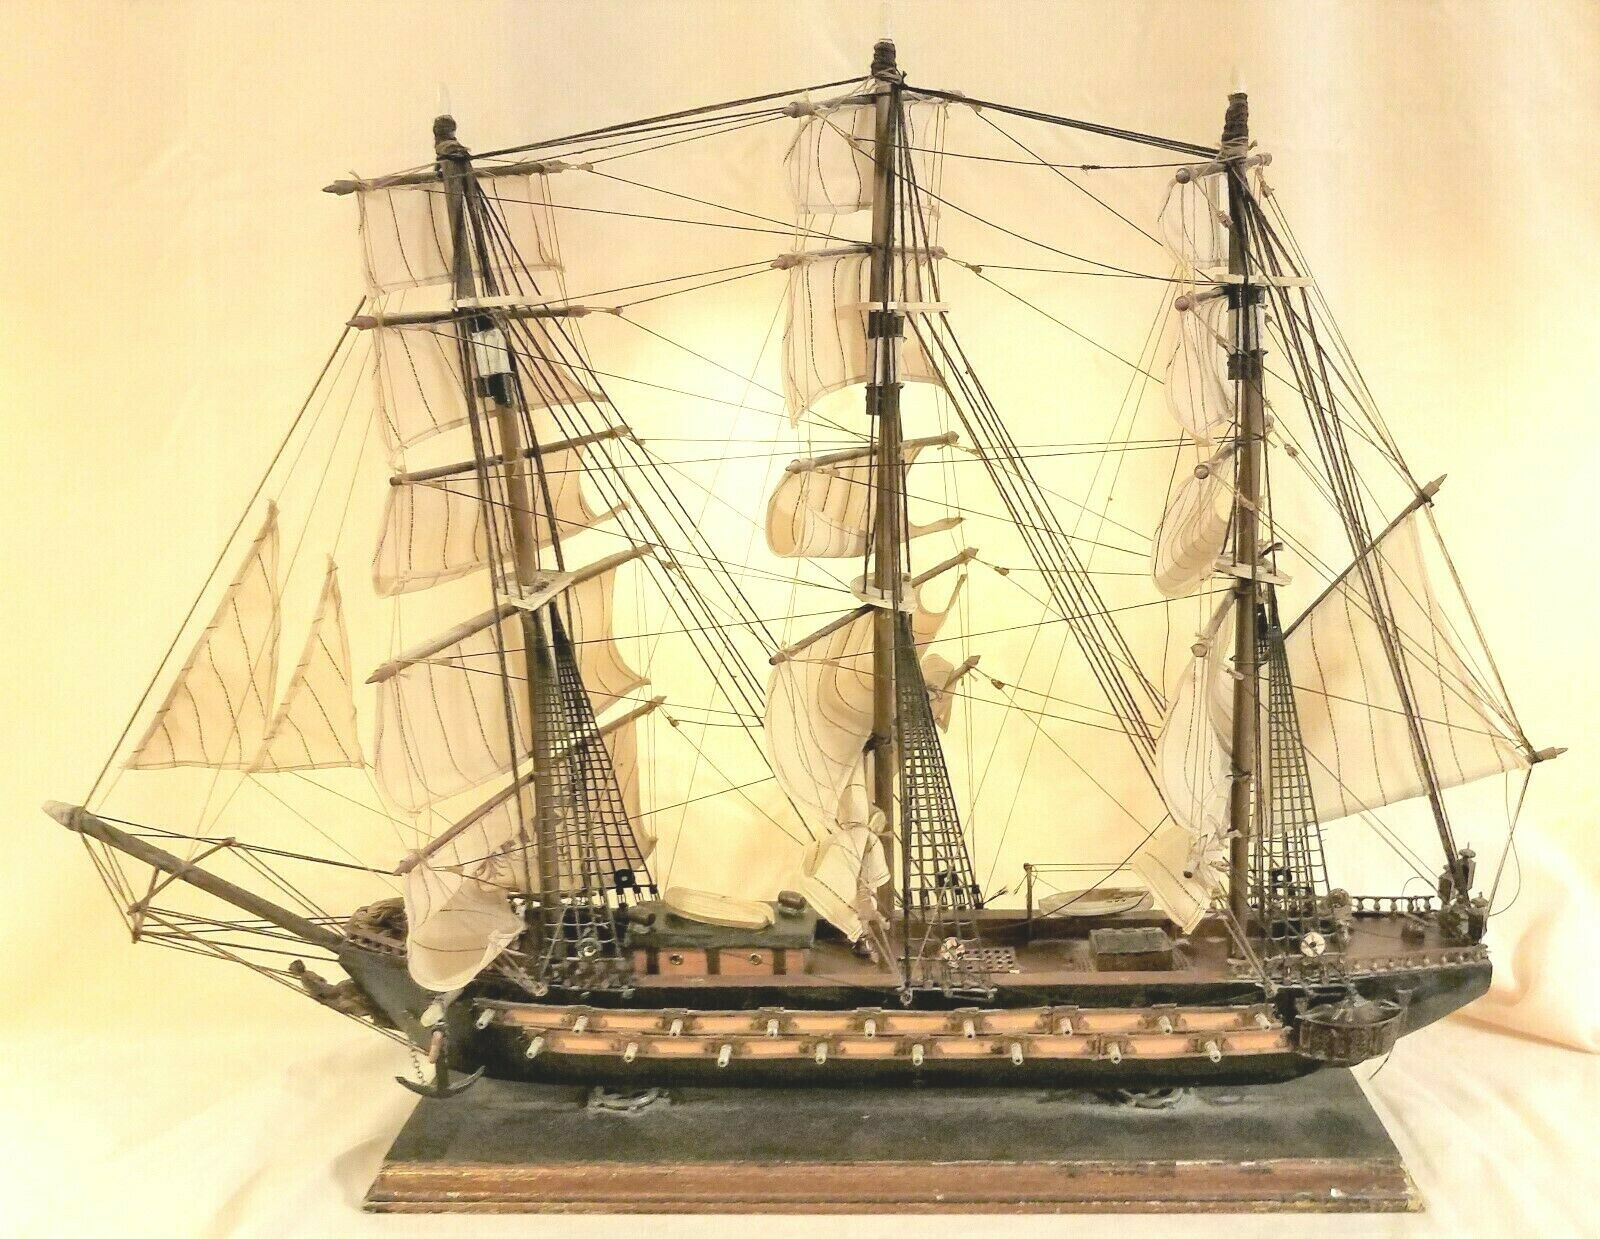 "FANTASTIC VINTAGE HAND CRAFTED FRAGATA ESPANOLA ANO 1780 MODEL SHIP. 32""X 24""."